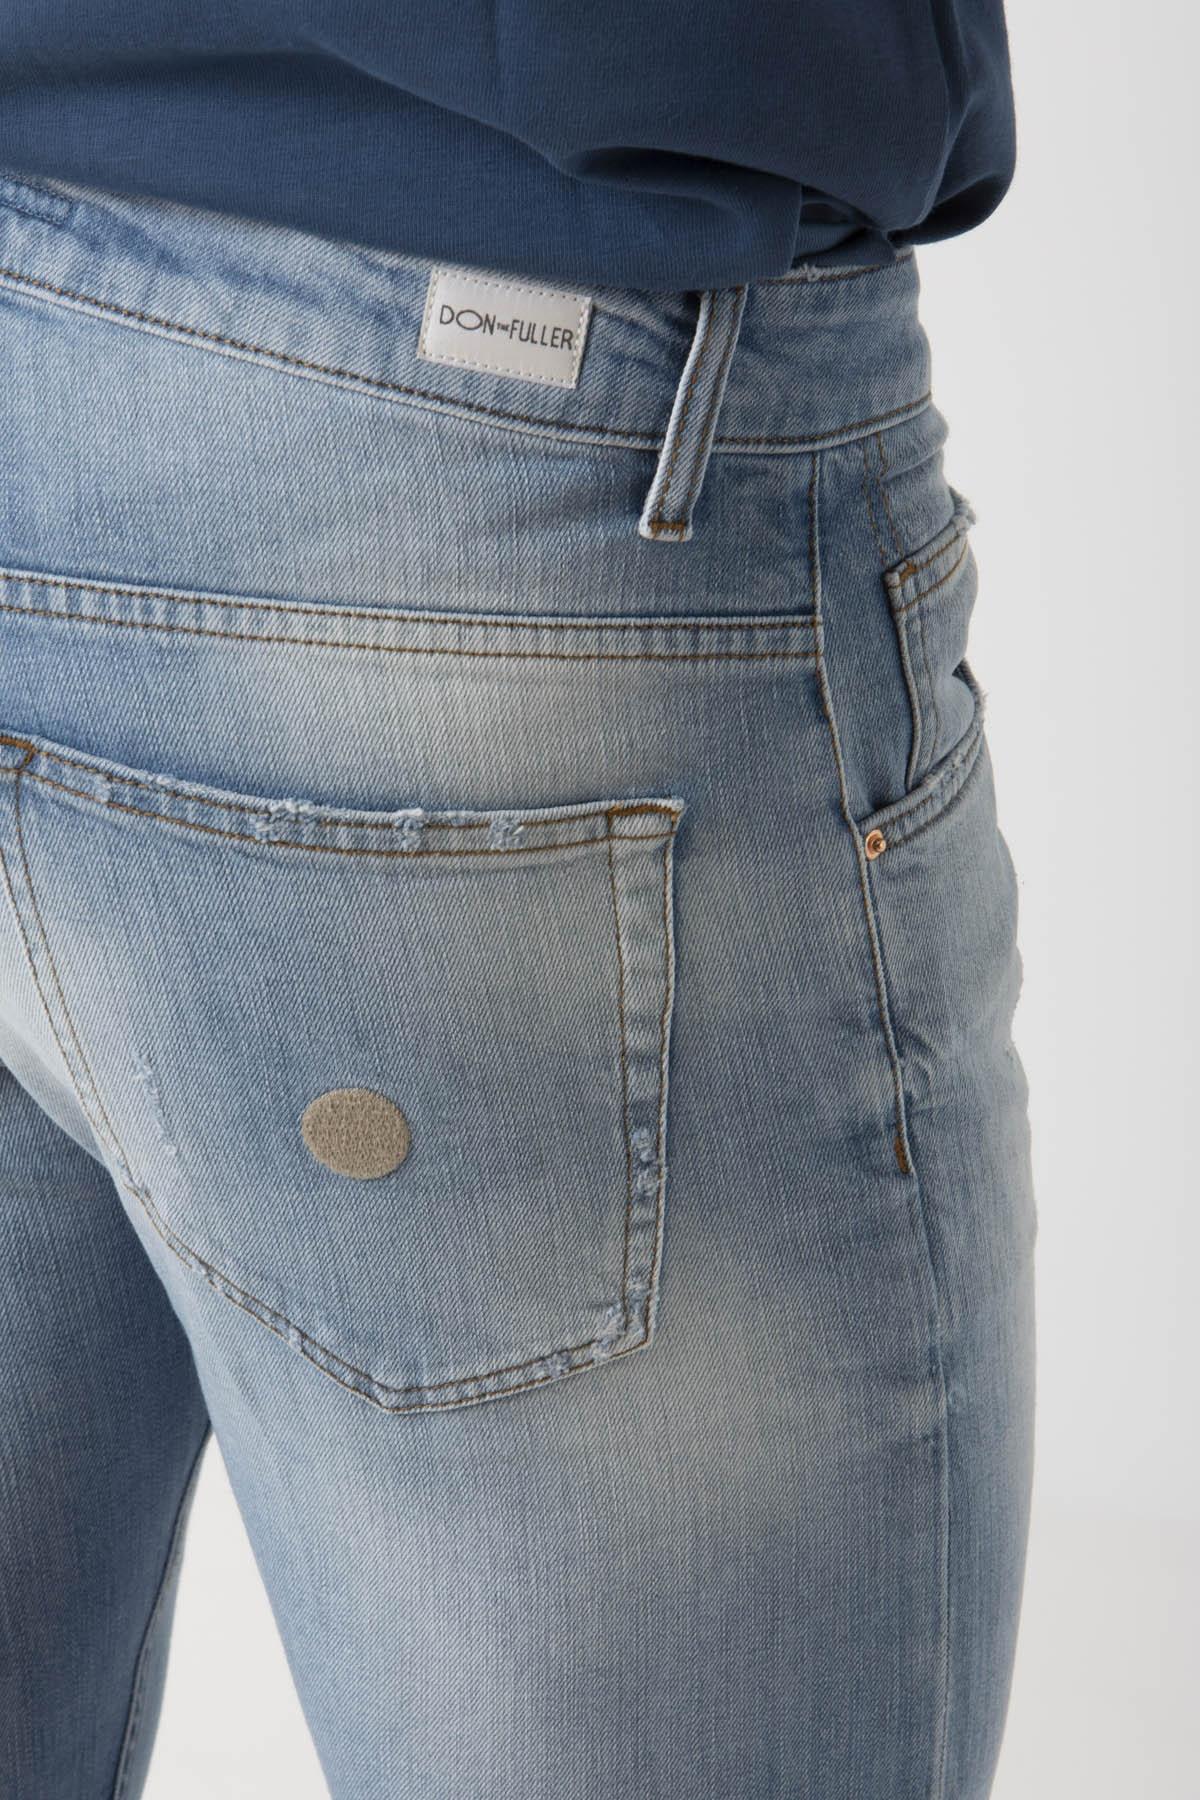 Männer Jeans YAREN DON THE FULLER F/S 19